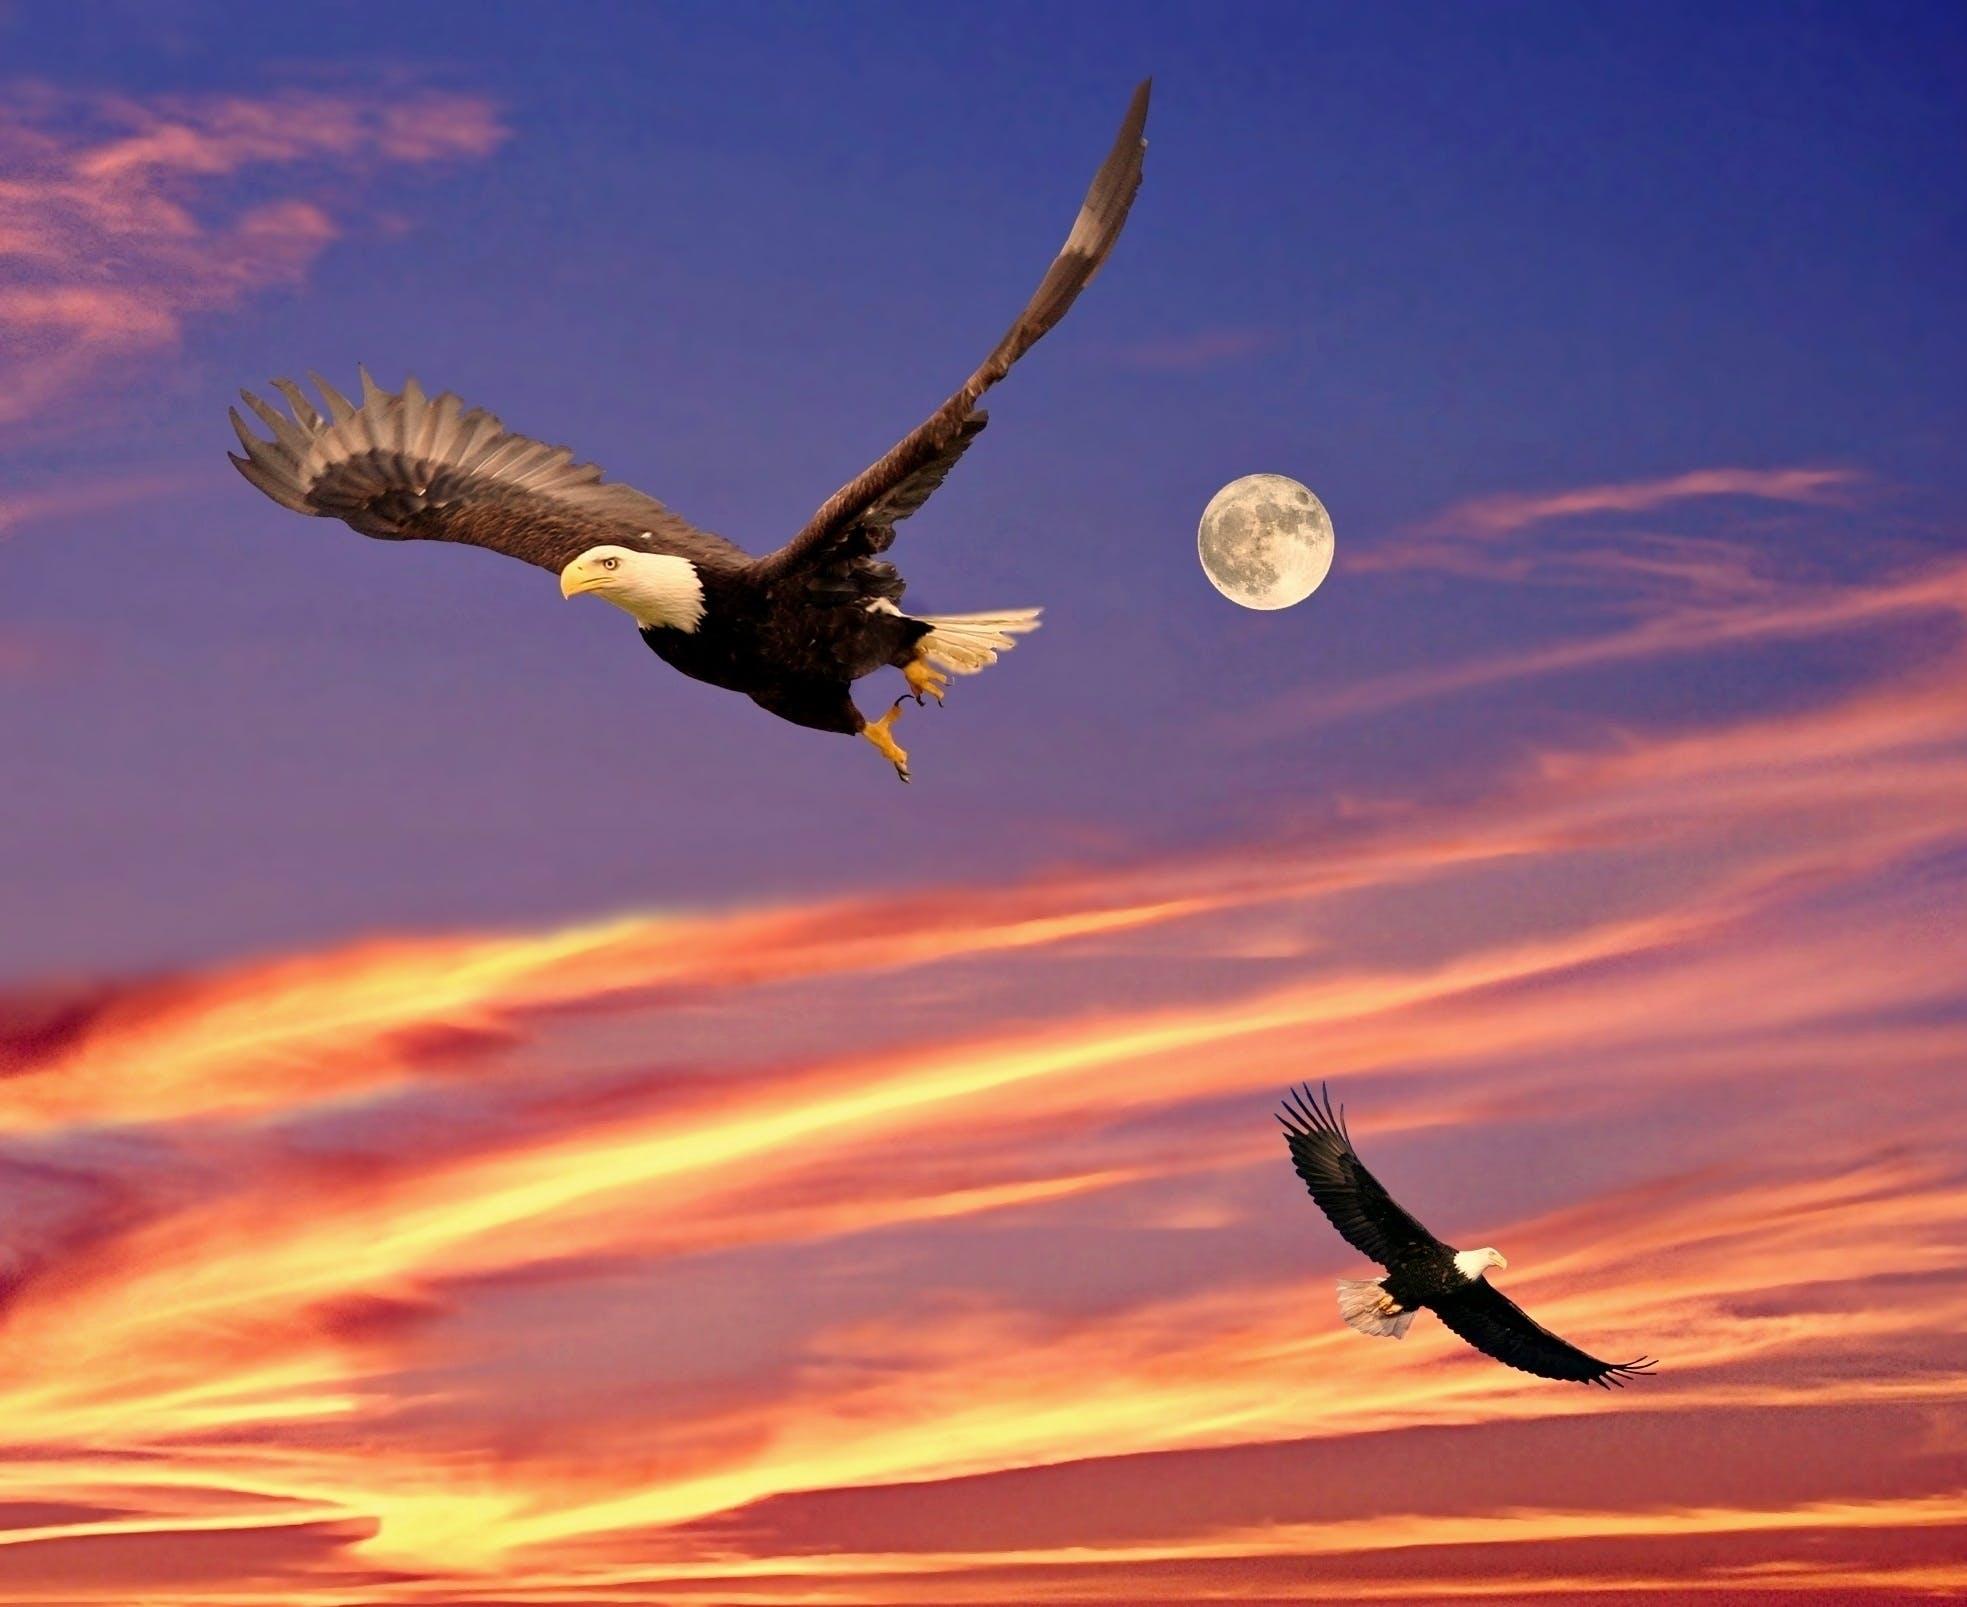 Free stock photo of ave, ave de rapina, águias, clouds